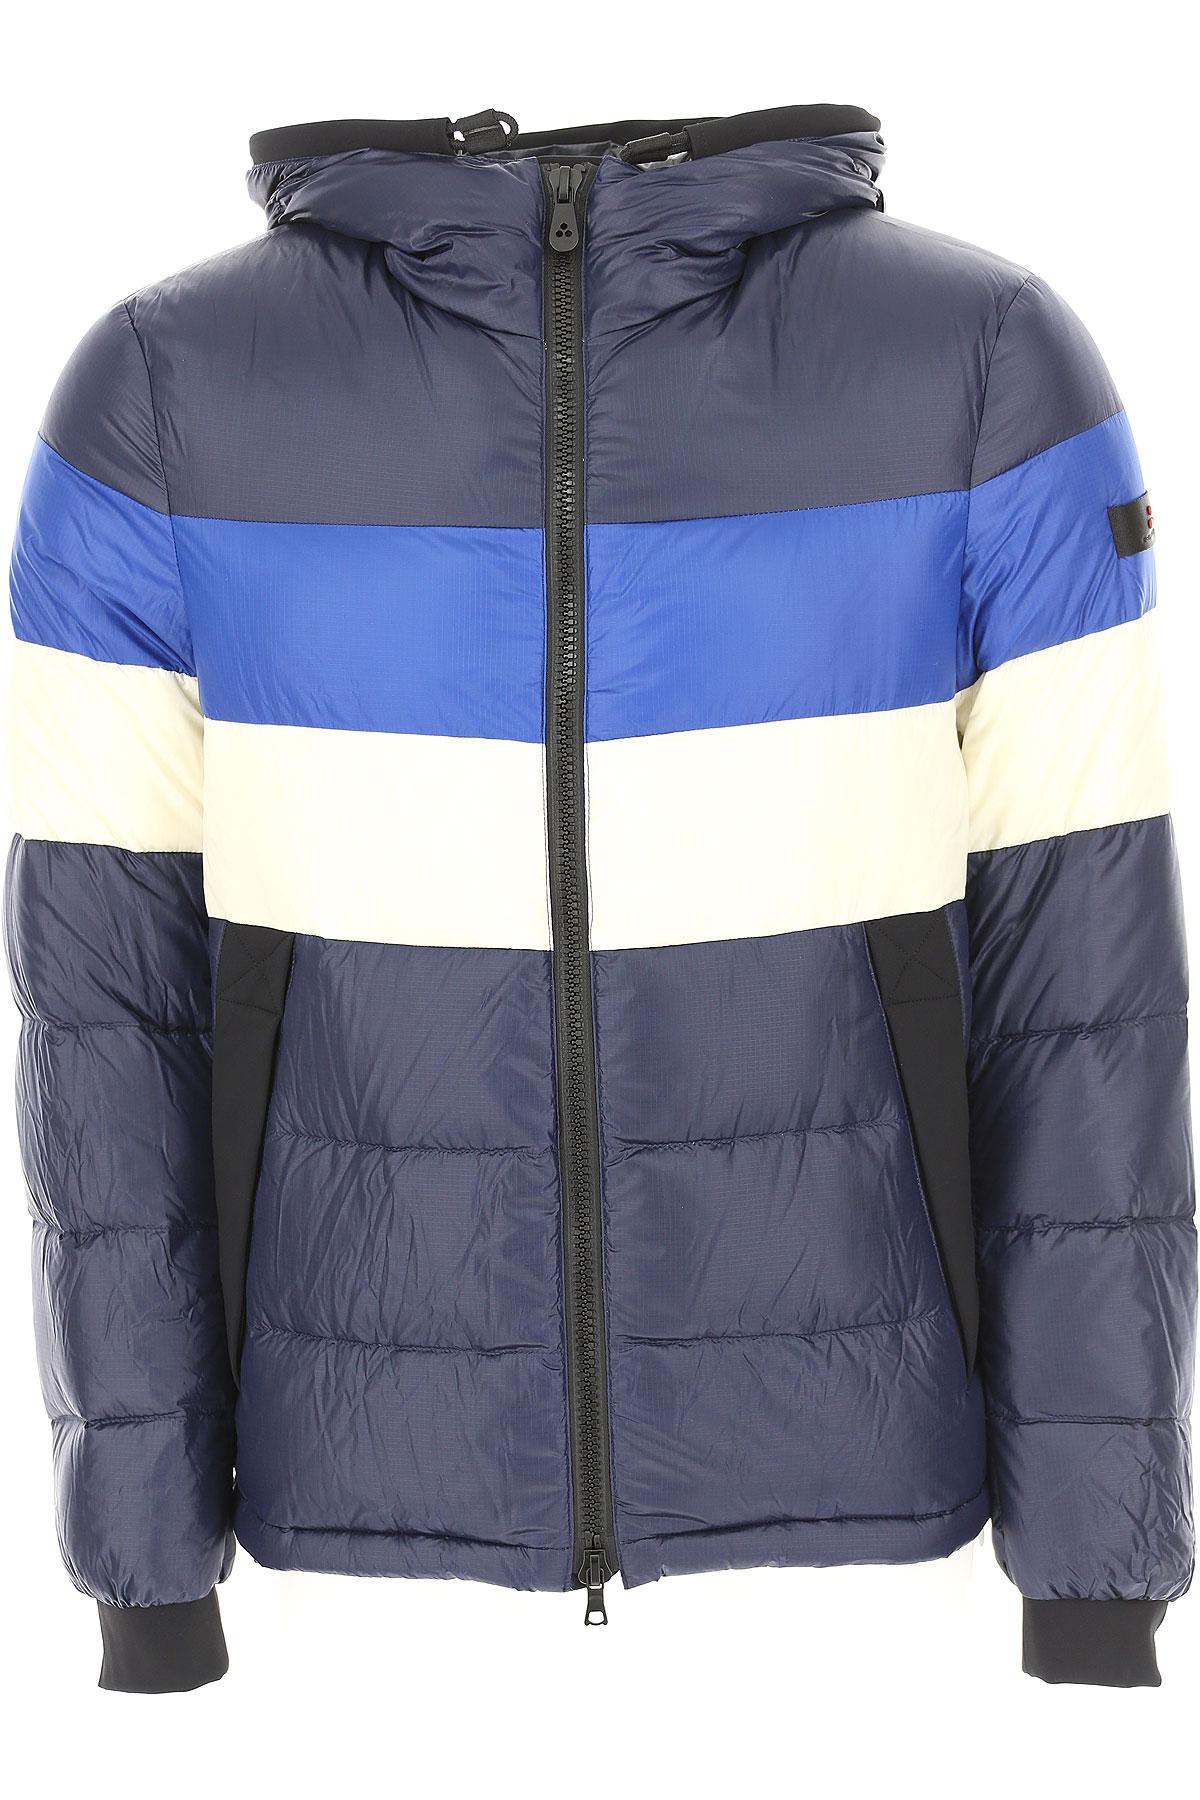 Image of Peuterey Down Jacket for Men, Puffer Ski Jacket, Dark Avio Blue Melange, Down, 2017, L M S XL